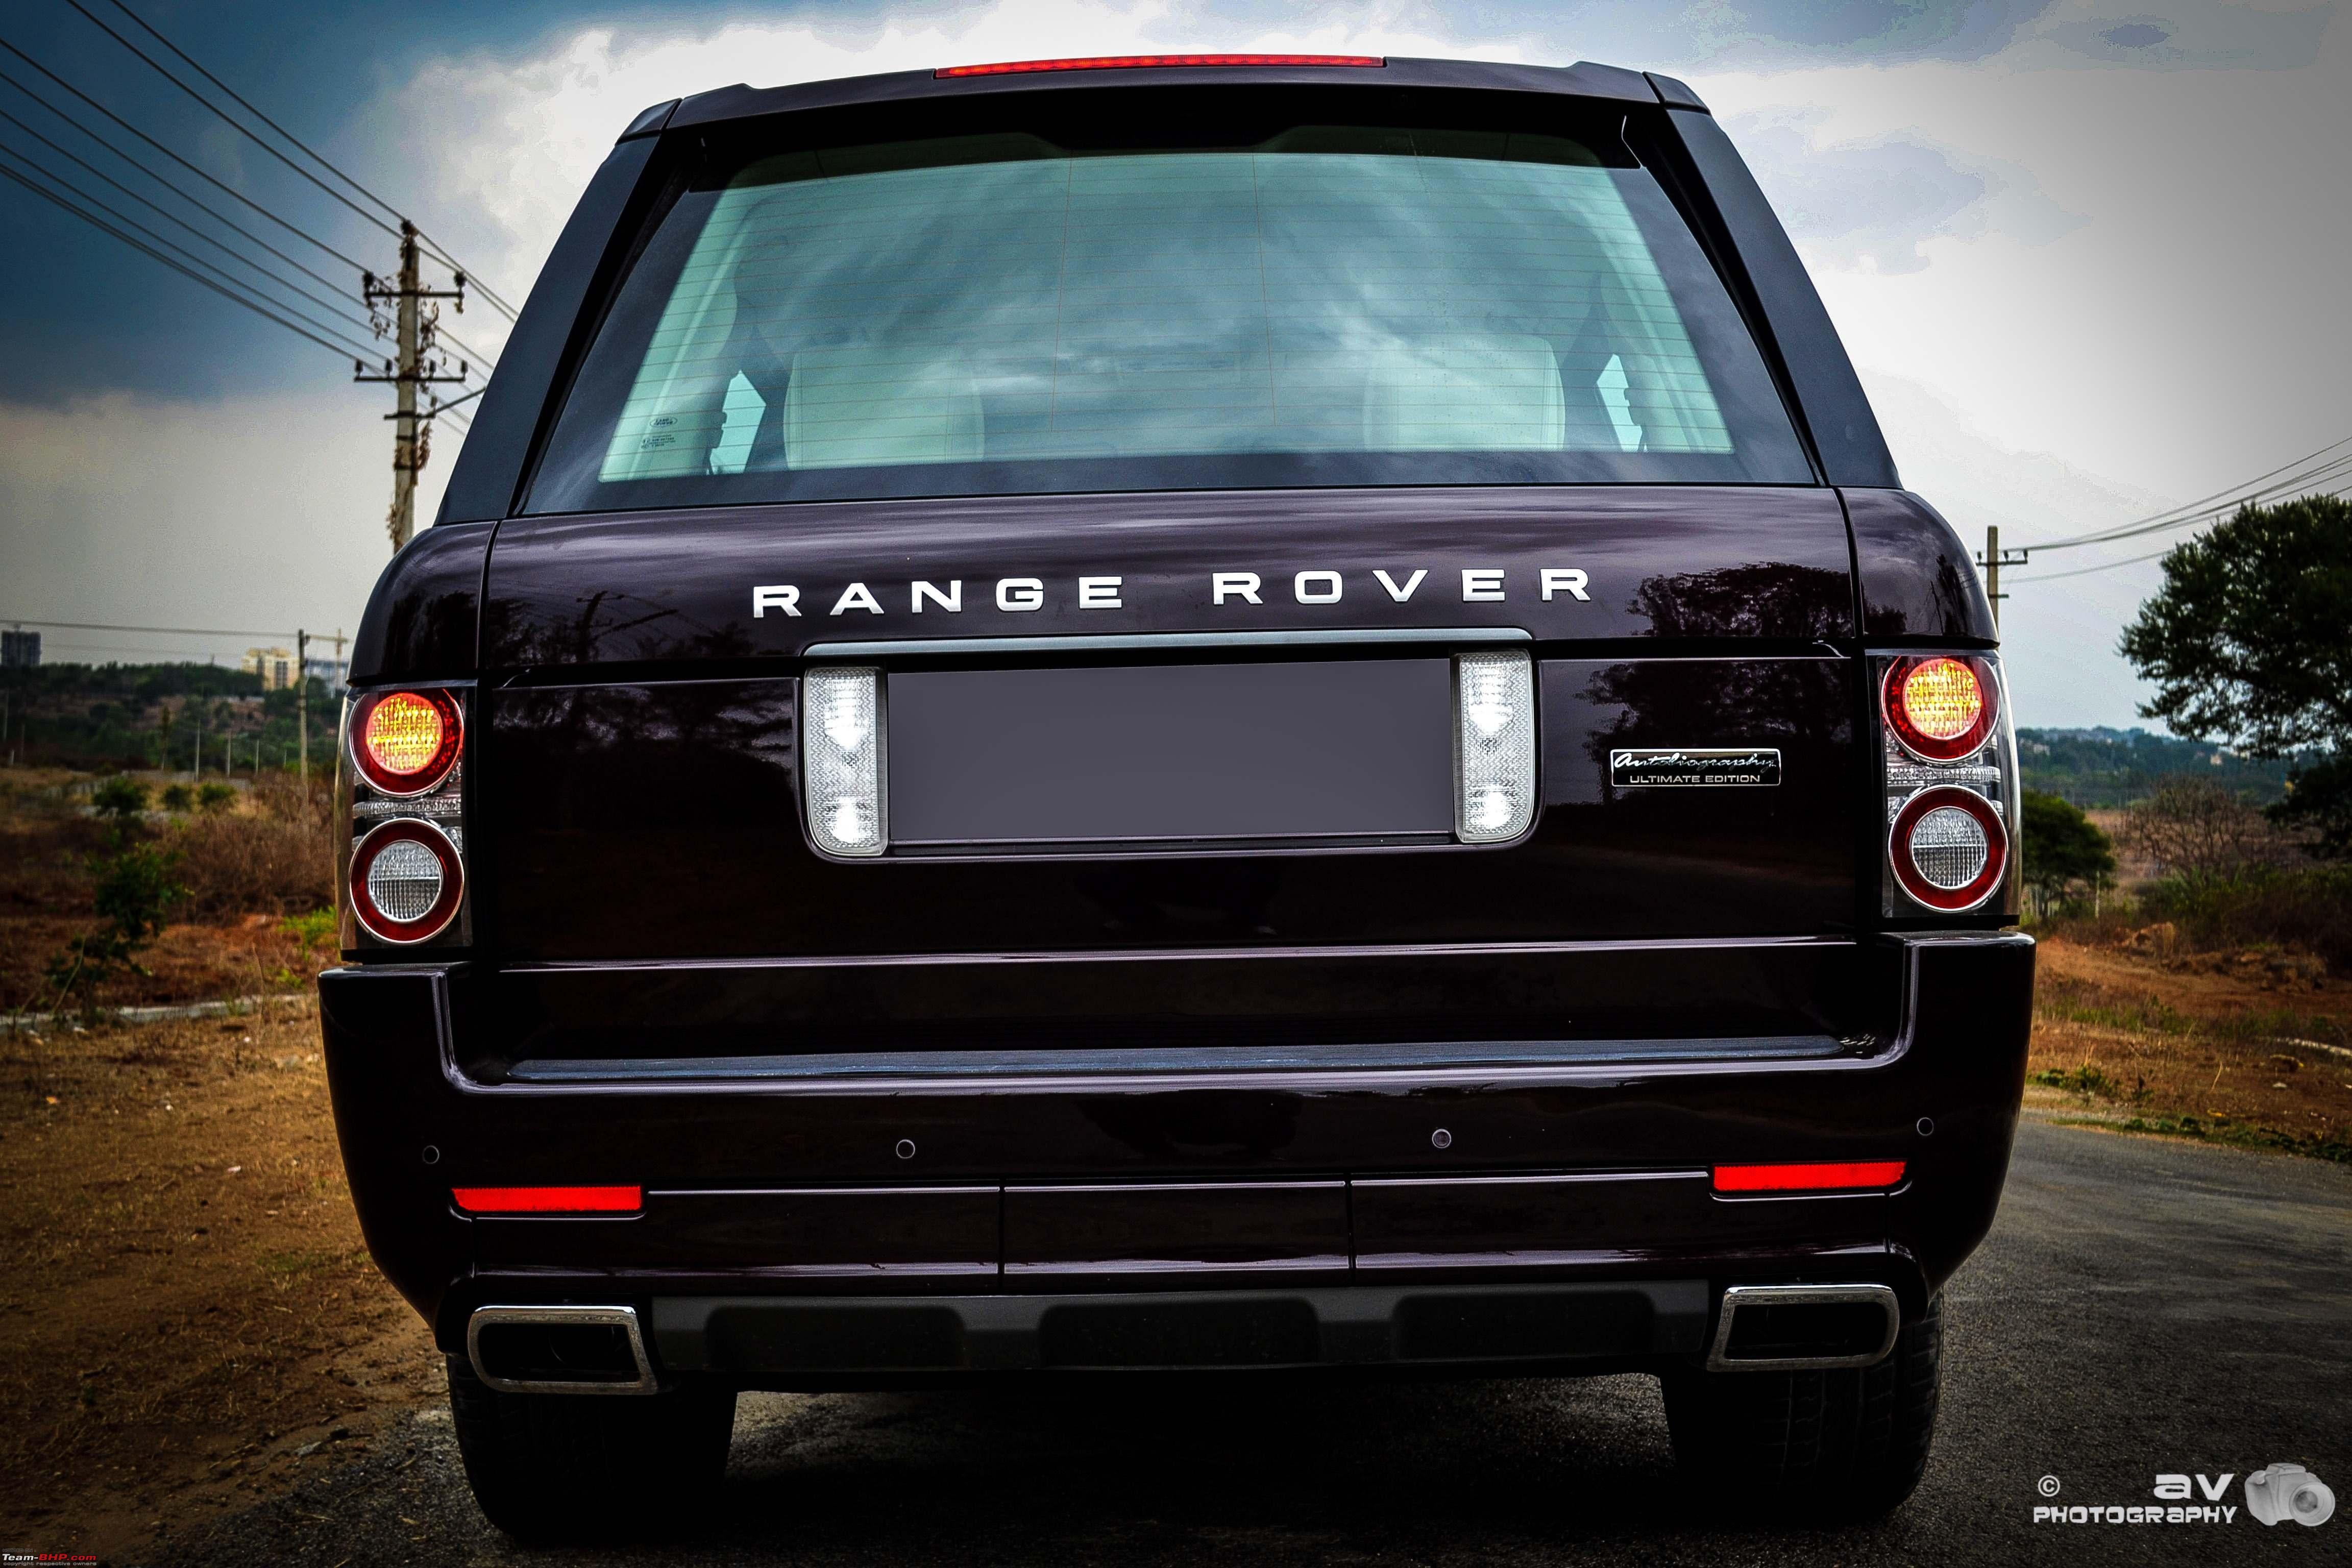 http://www.team-bhp.com/forum/attachments/super-cars-imports-india/1052767d1361162101-2012-range-rover-autobiography-ultimate-edition-rr-autobiography-ultimate-edition-013.jpg